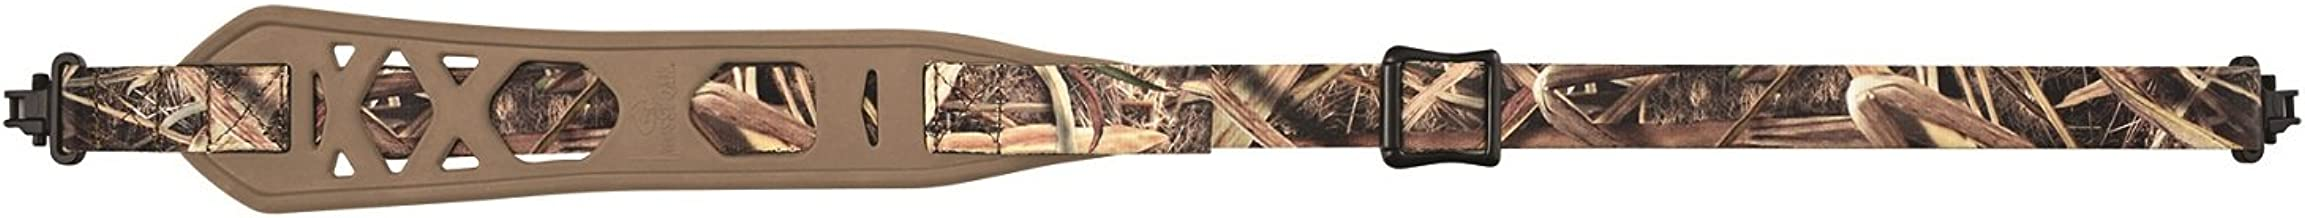 Mossy Oak Hunt Chickasaw Gun Sling, Mossy Oak Shadow Grass Blades